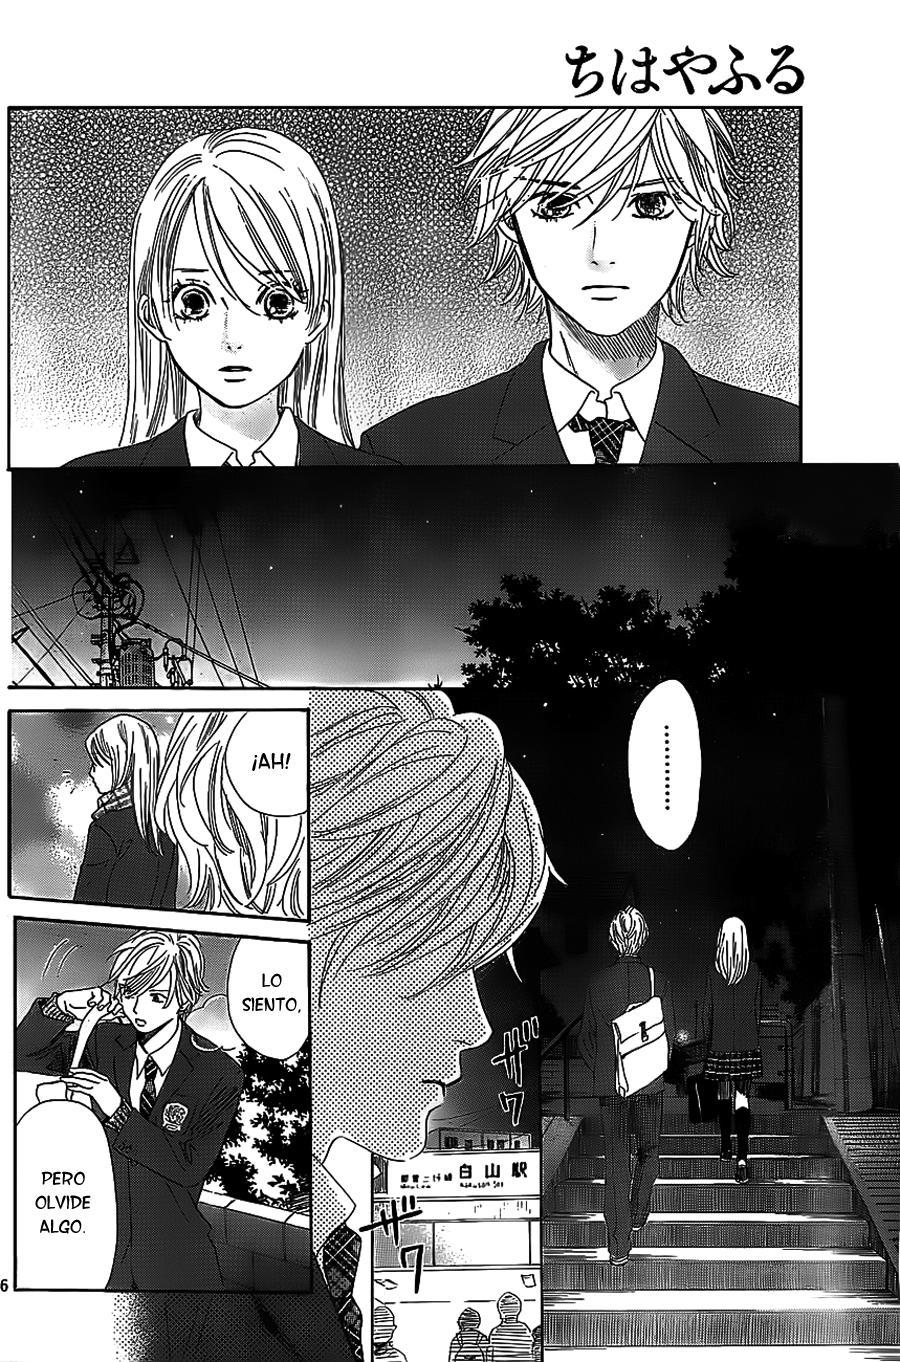 https://c5.ninemanga.com/es_manga/32/1824/444173/e7dd74d3b33705b5224ce64213d1316d.jpg Page 27